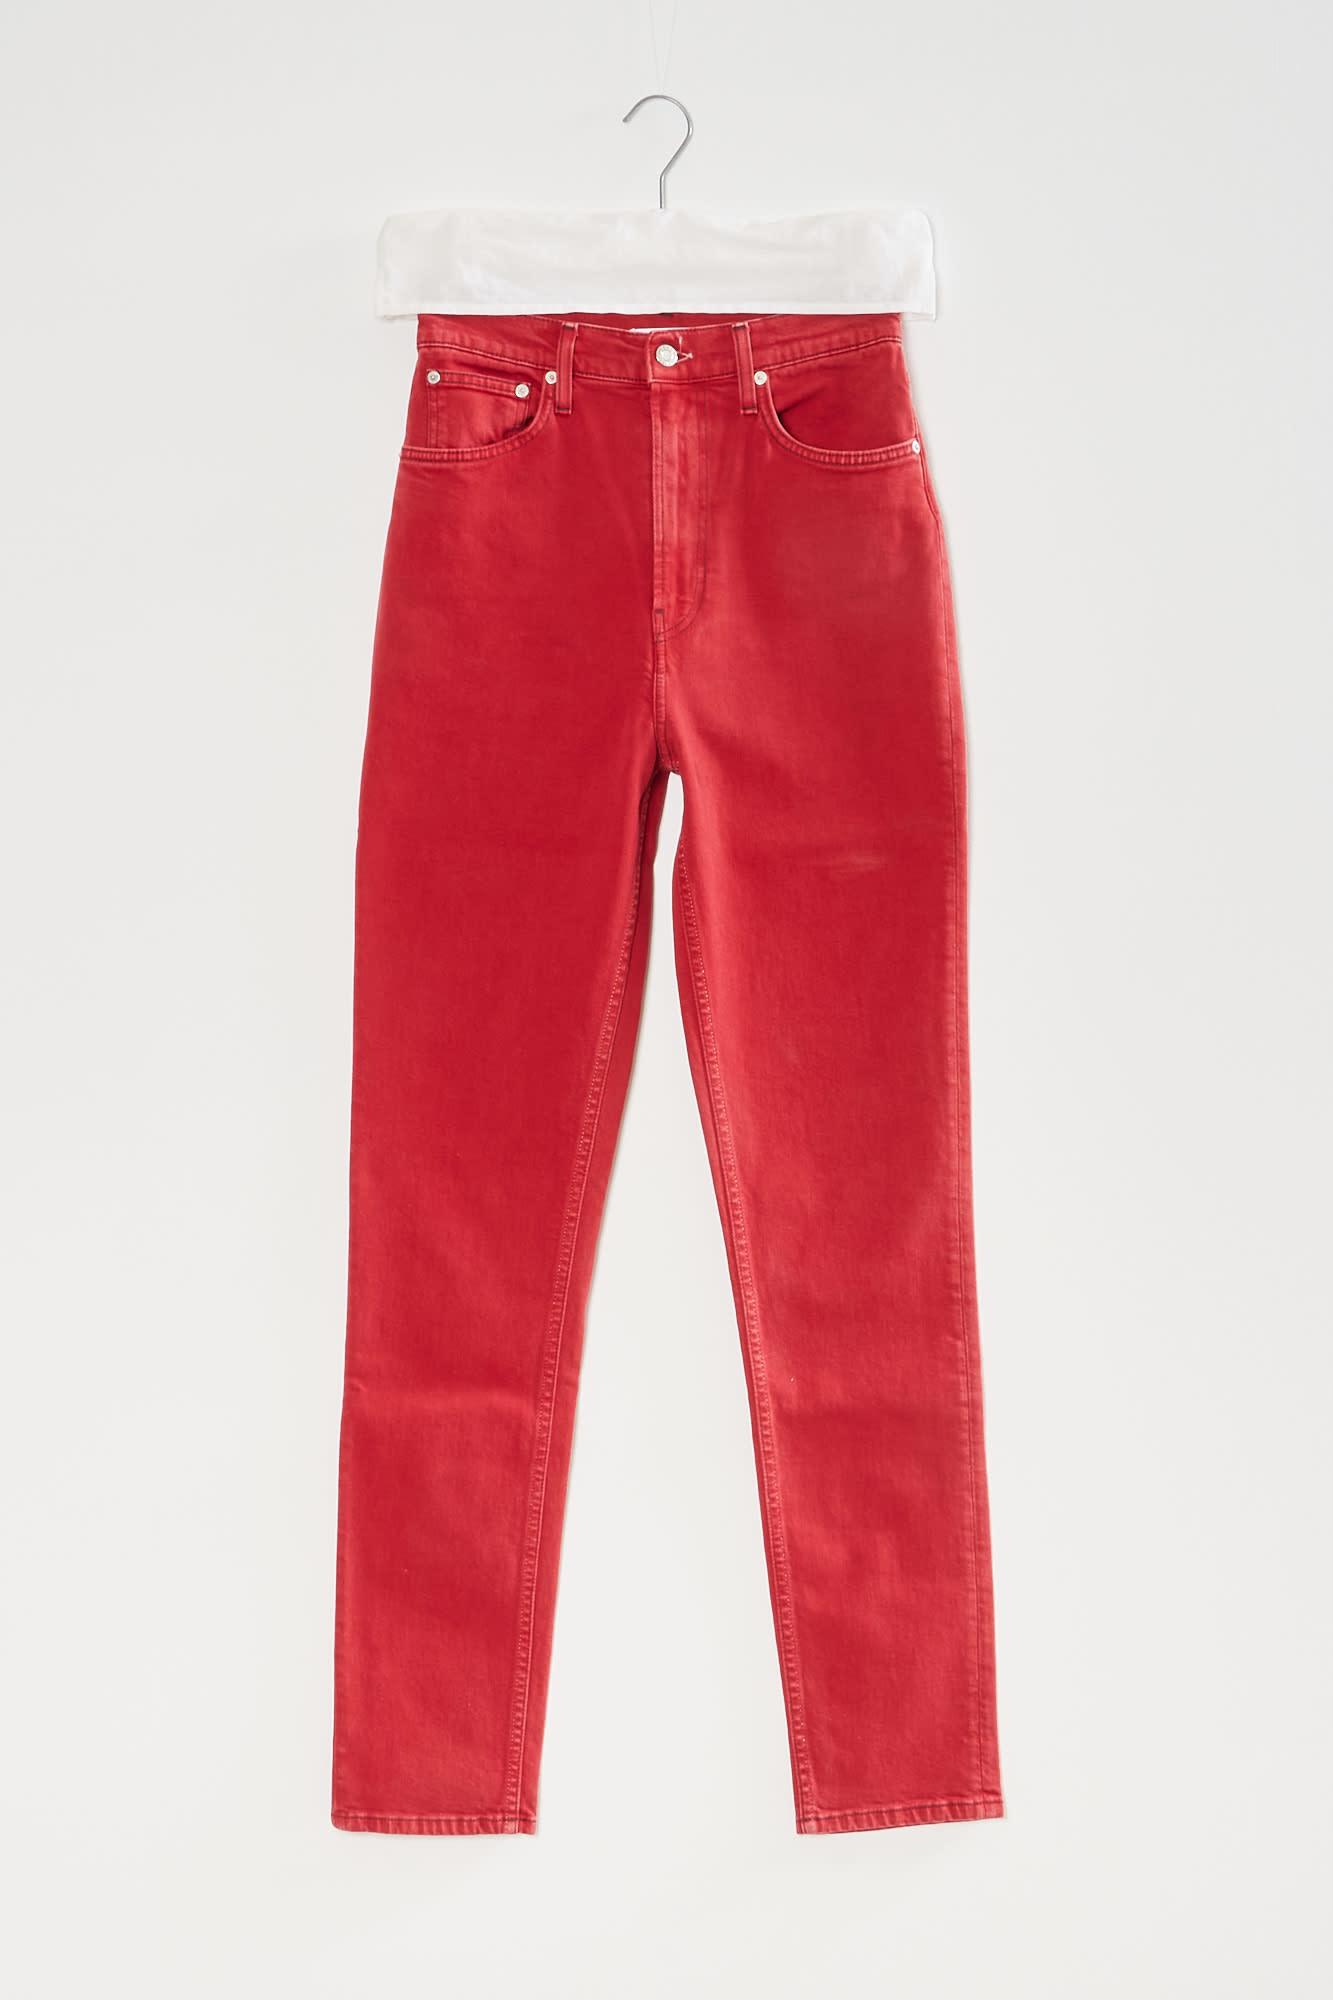 Helmut Lang femme hi spikes jeans red ymm